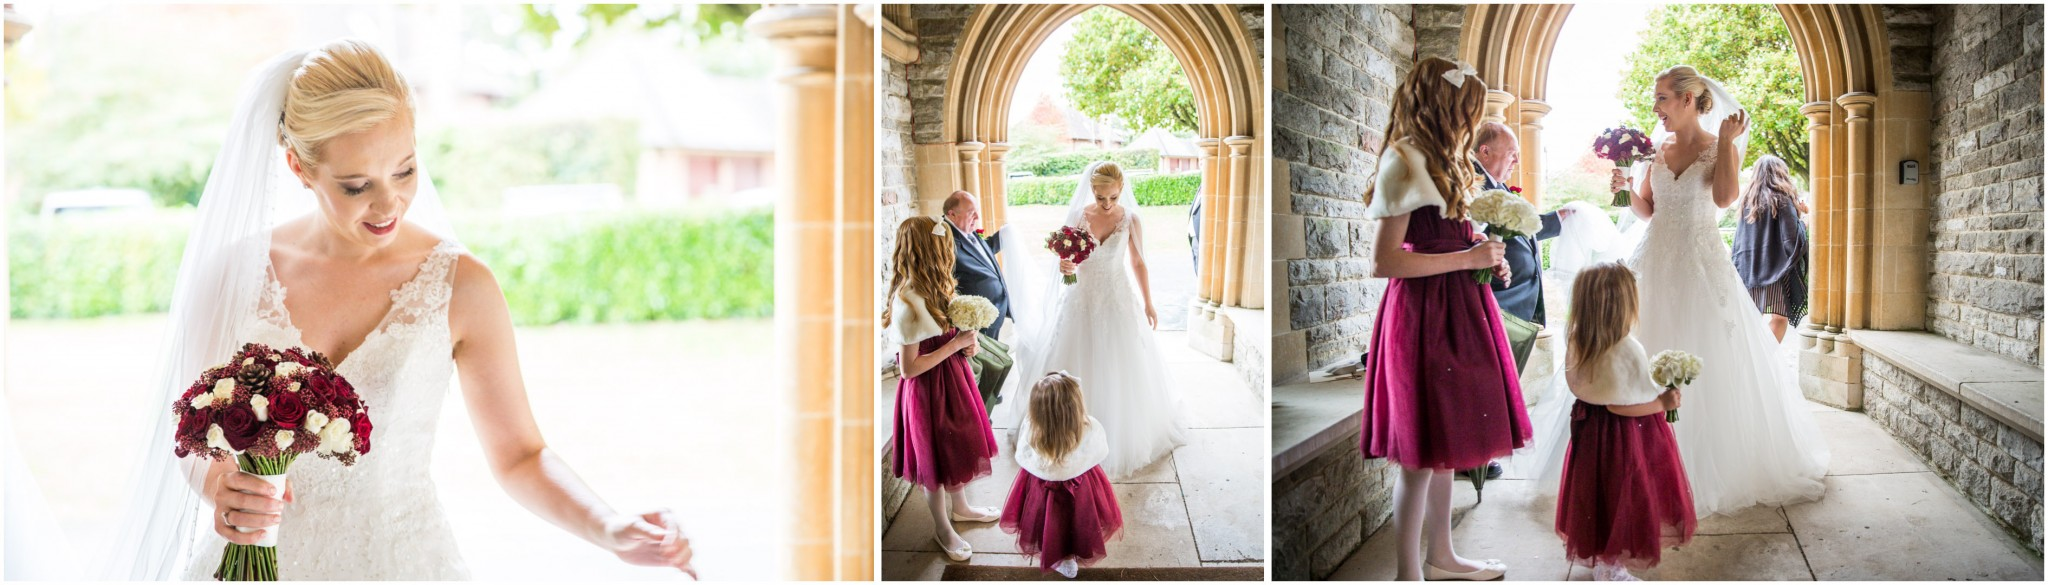 Bride arrving at St Saviours Church Brockenhurst wedding